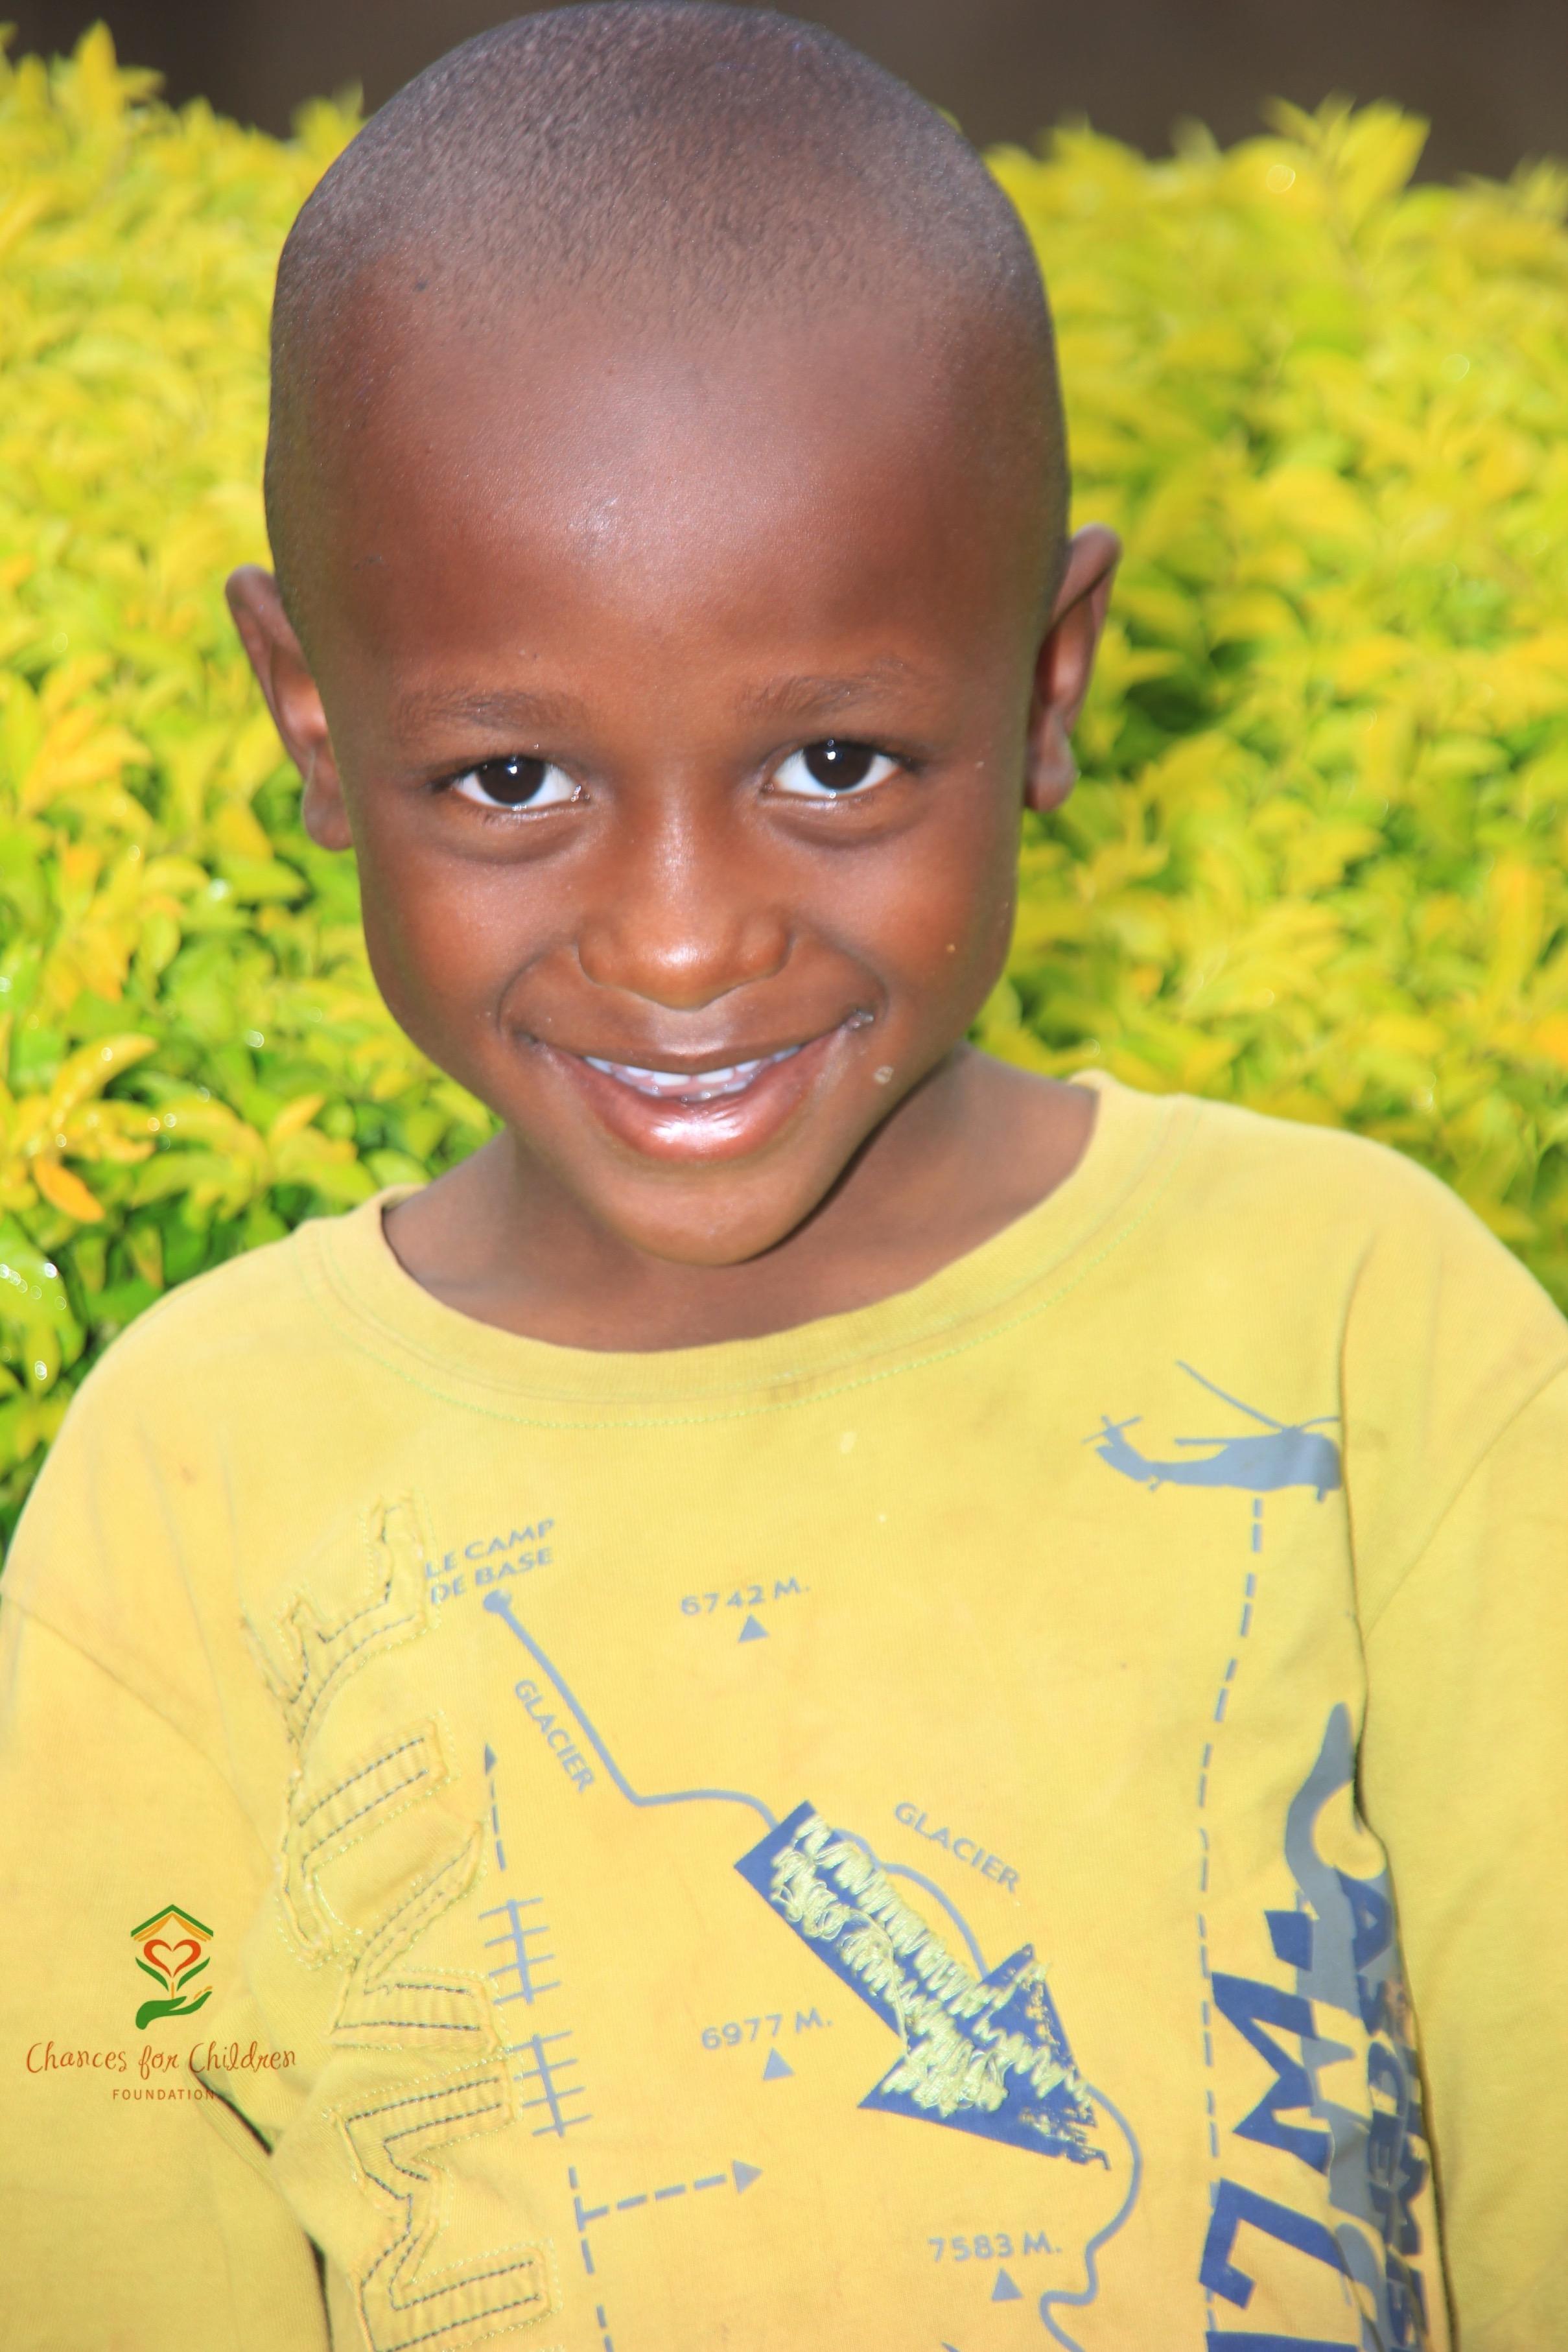 c4c-charity-uganda-children-portraits-20